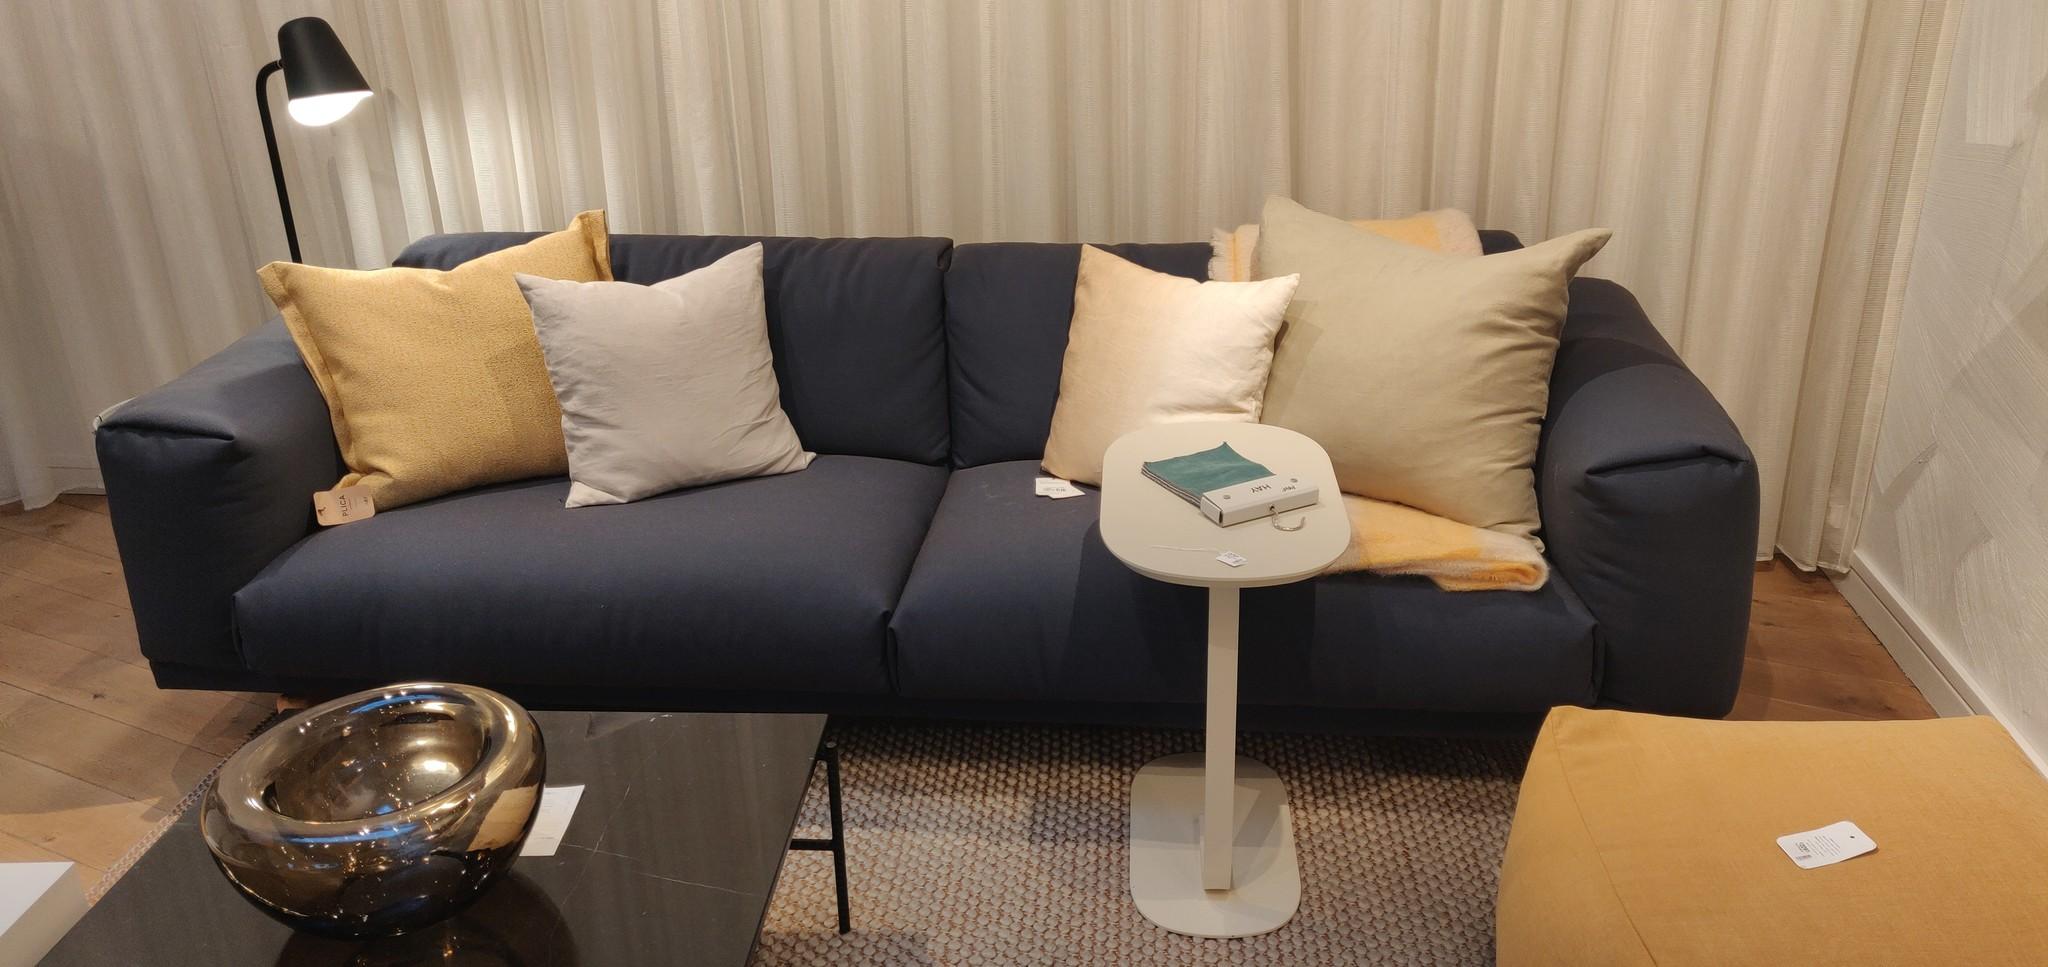 Toonzaalmodel Rest sofa - 3-seater - Steelcut trio3 756-3